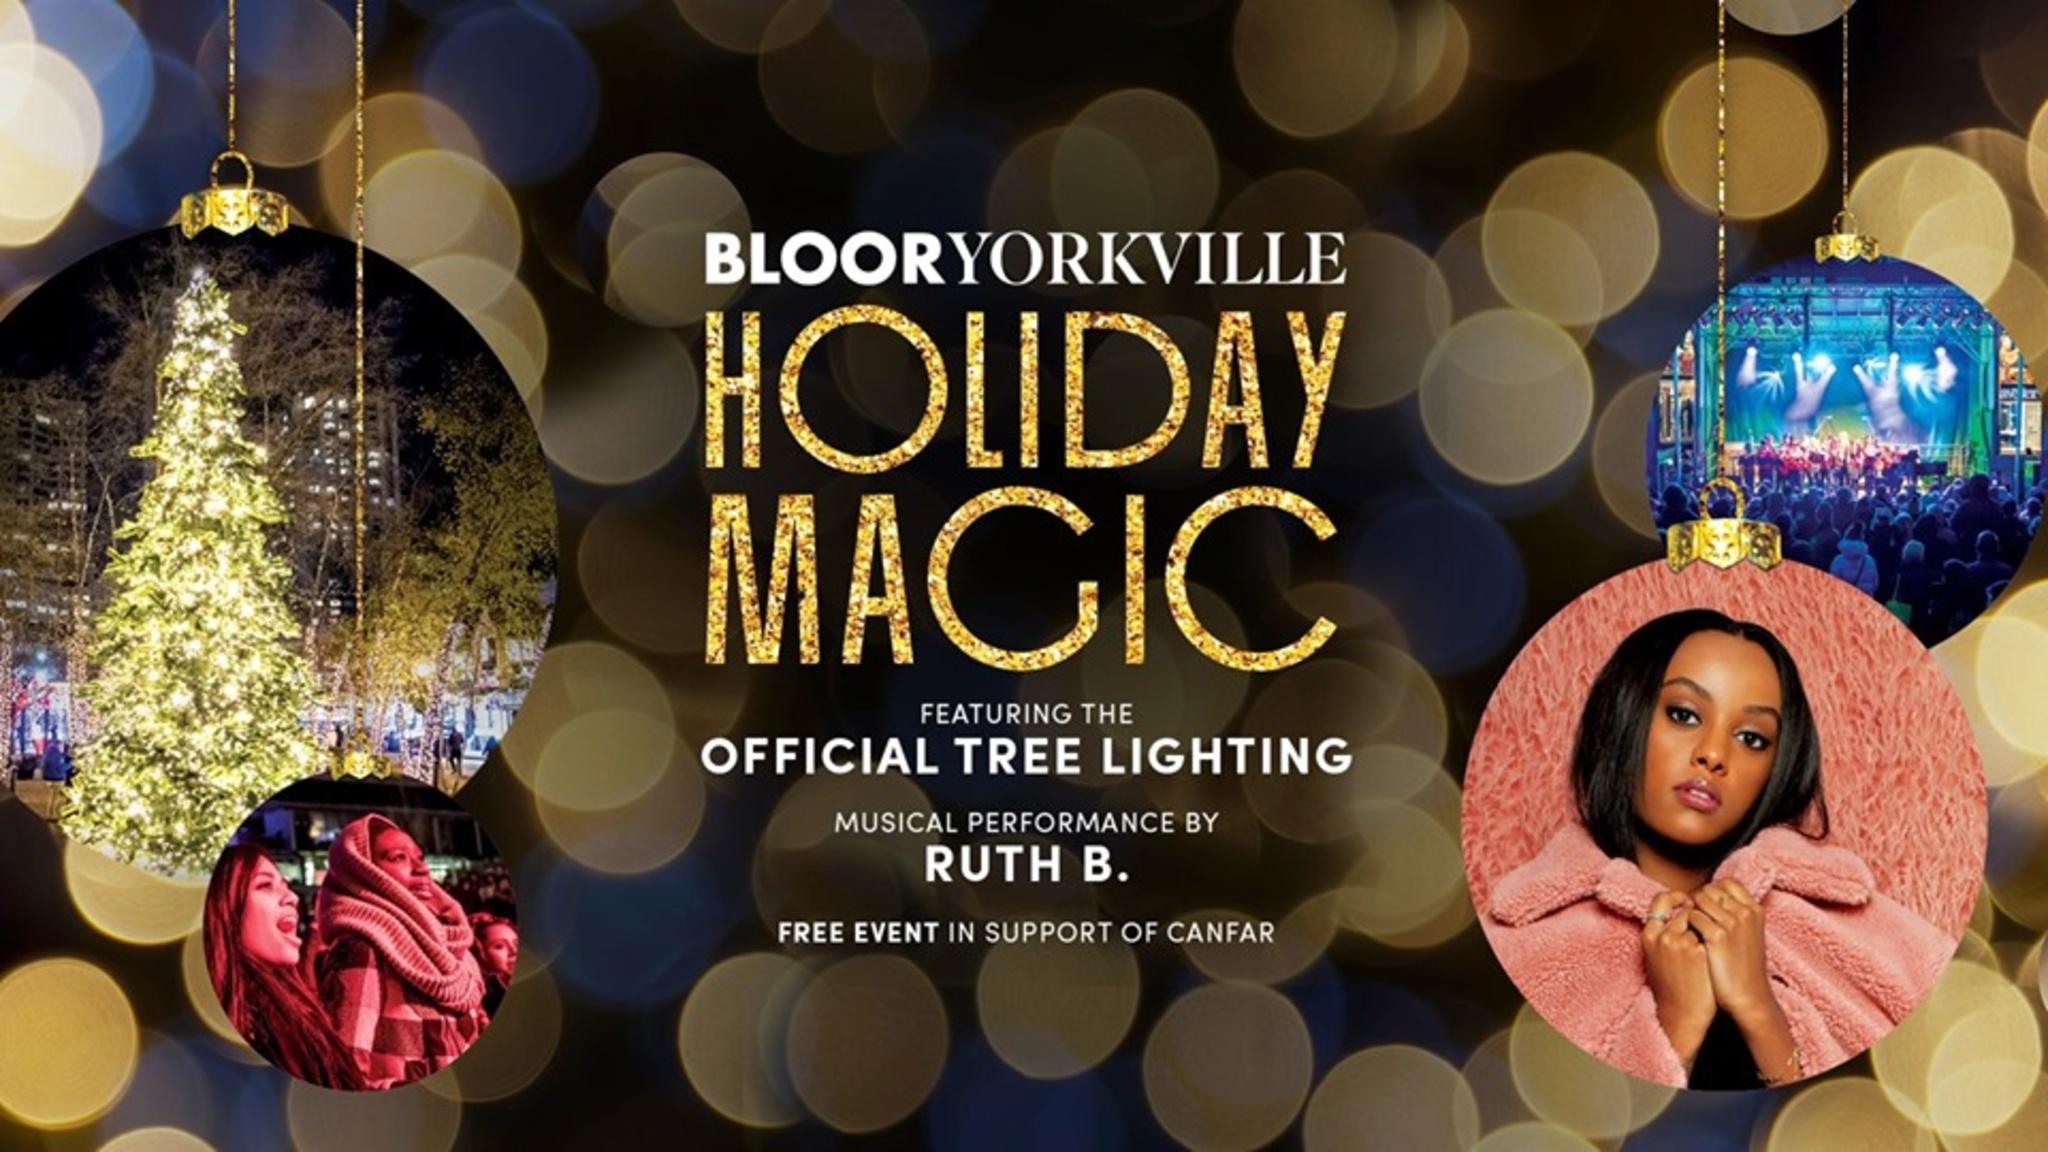 [Toronto] Nov 23rd: Bloor-Yorkville Holiday Magic 2019 - Singer Ruth B. in attendance